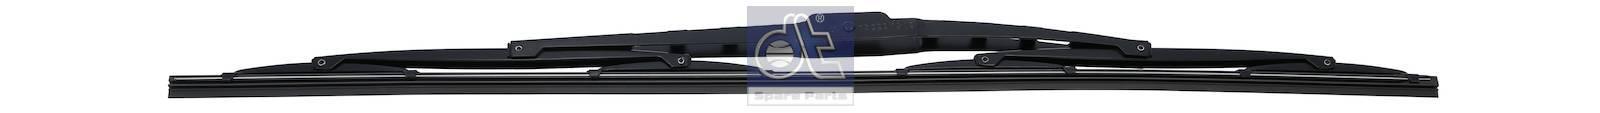 Escova de limpador de pára-brisa